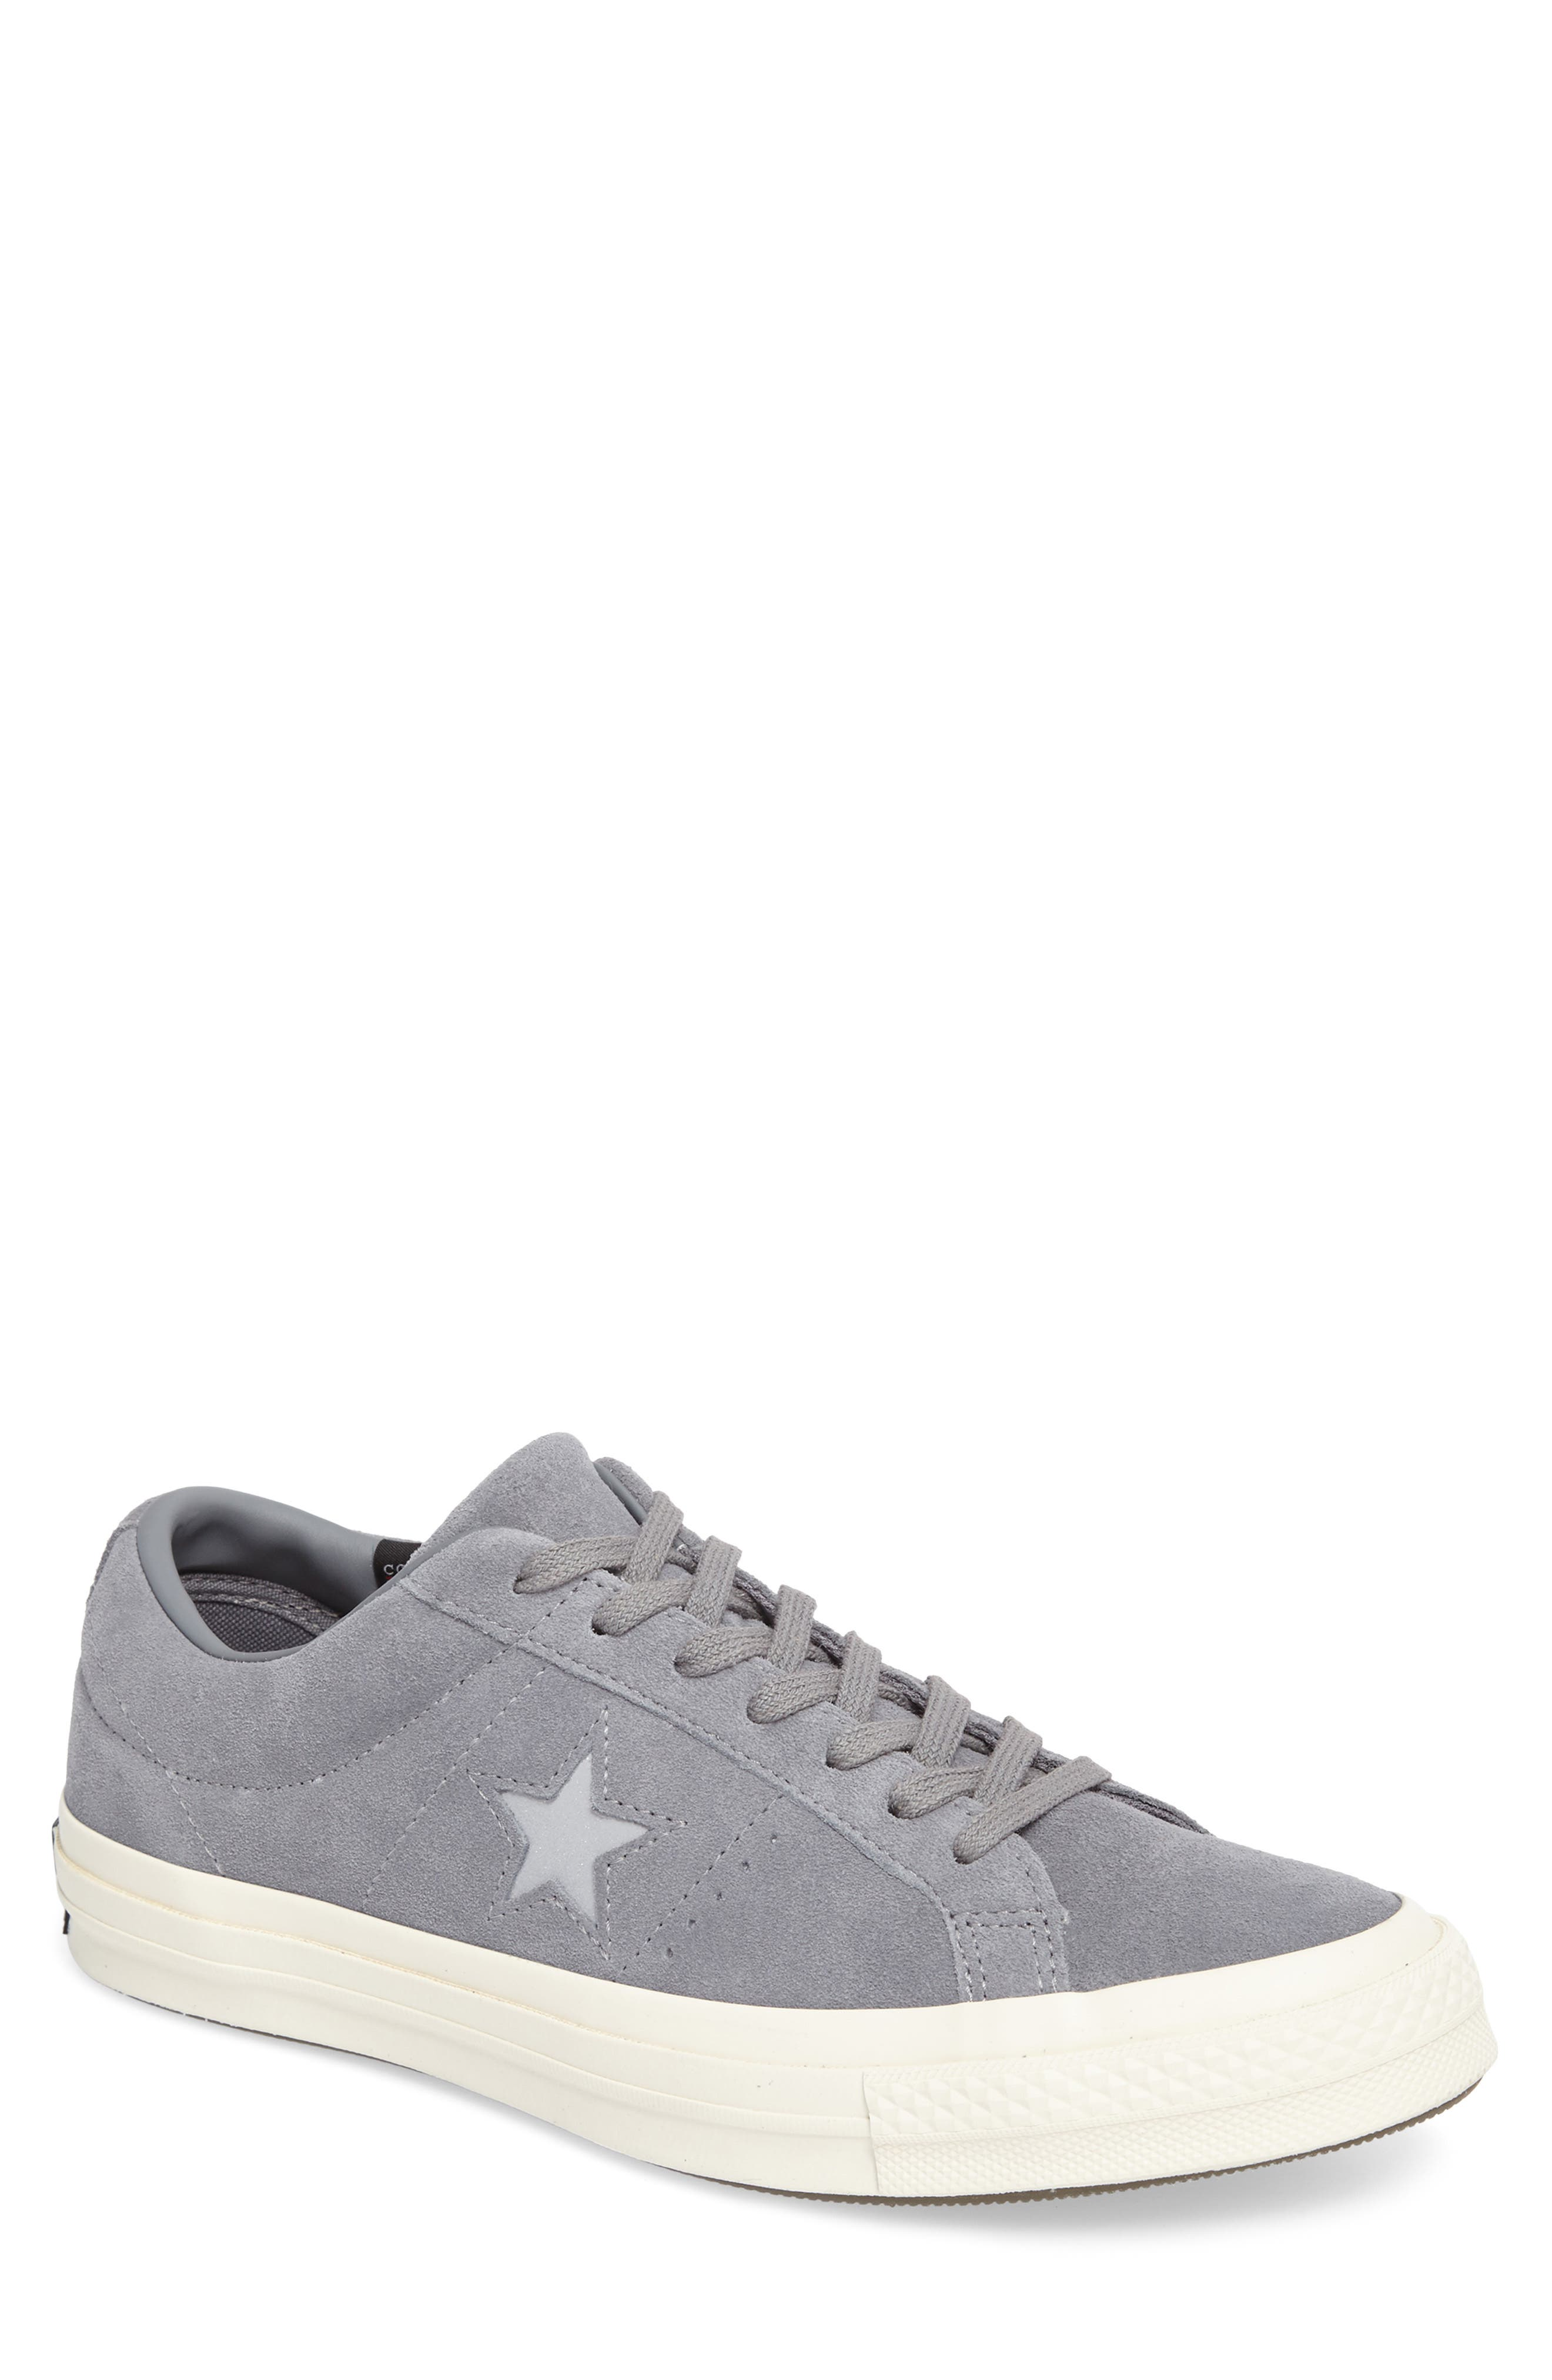 Main Image - Converse One Star Sneaker (Men)